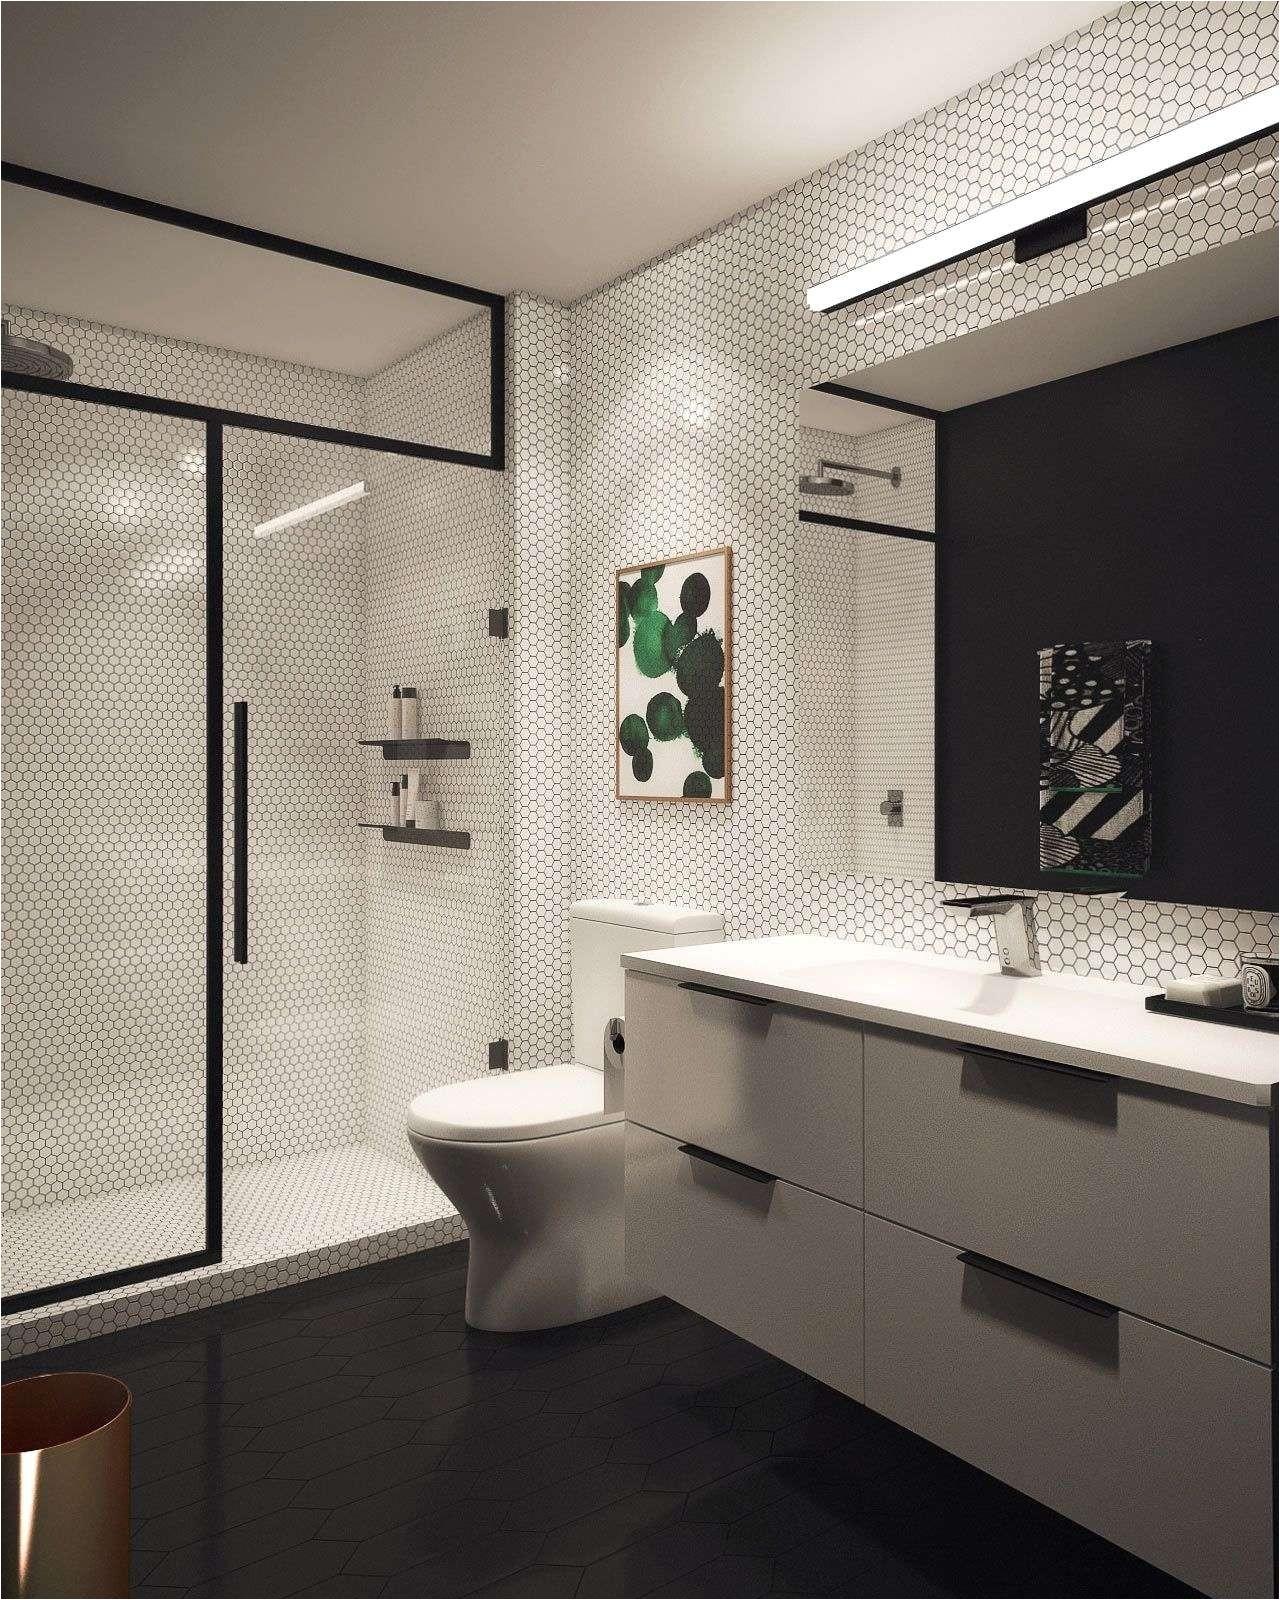 bathroom ideas for small bathrooms decorating 2019 lovely small bathroom lighting fresh tag toilet ideas 0d